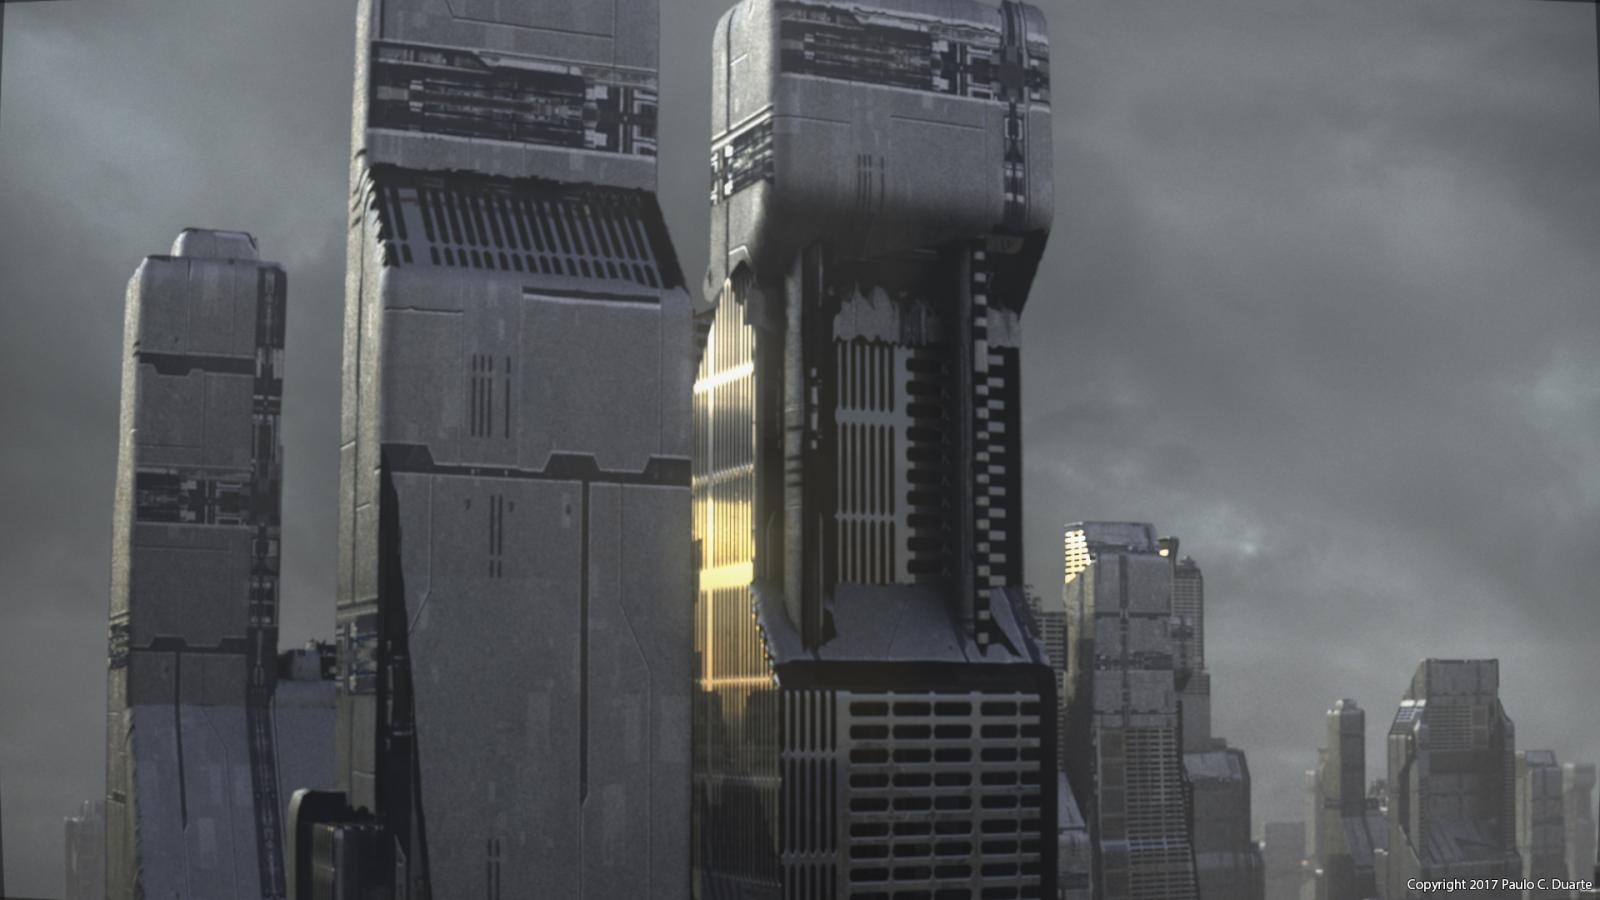 sci-fi_city_concept_002a.jpg